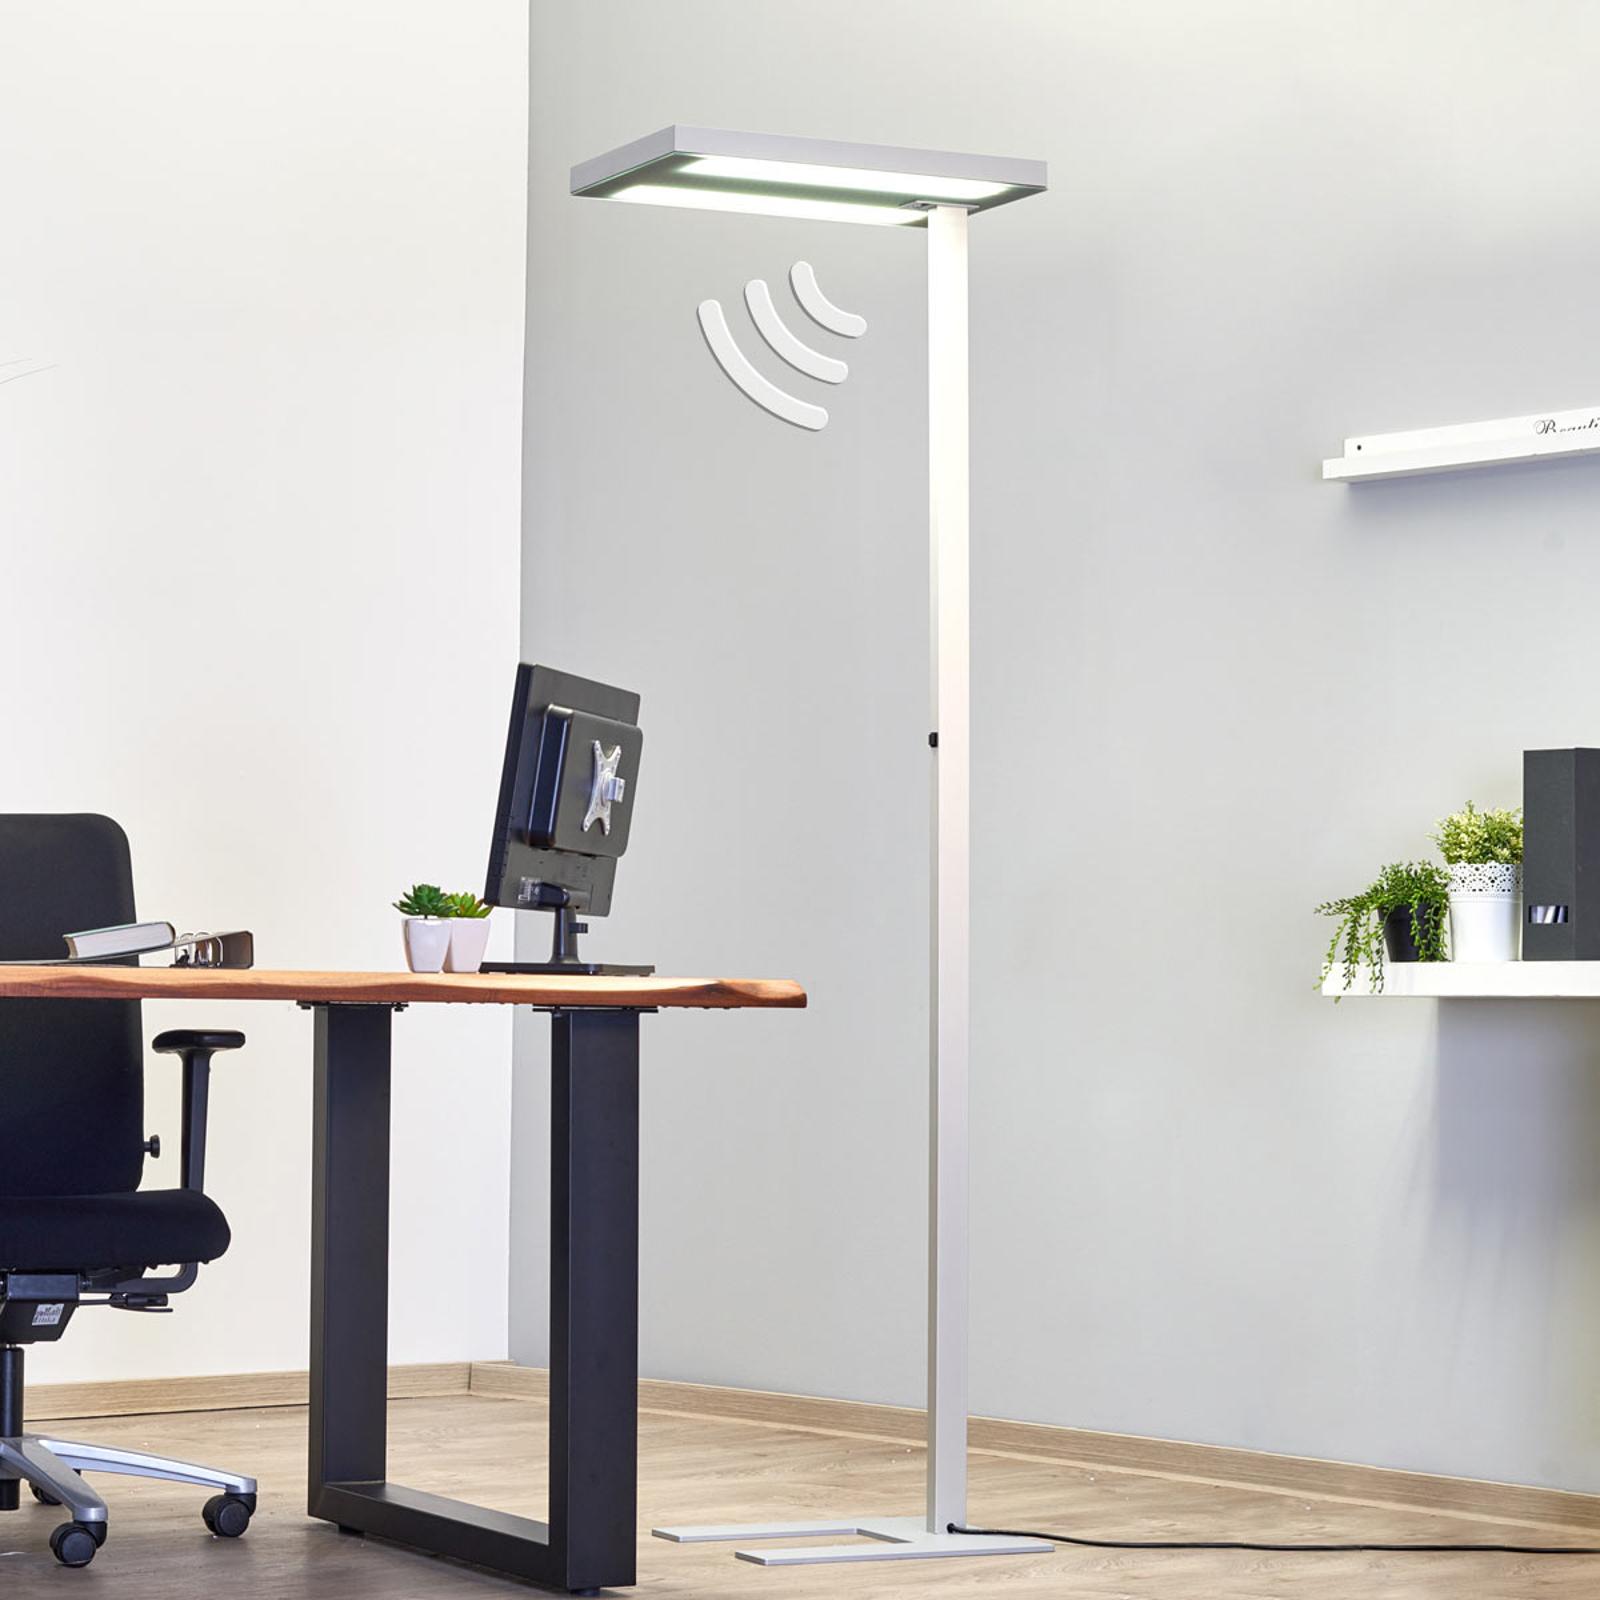 Vloerlamp Free-F LED10000 HFDd 840 SD grijs